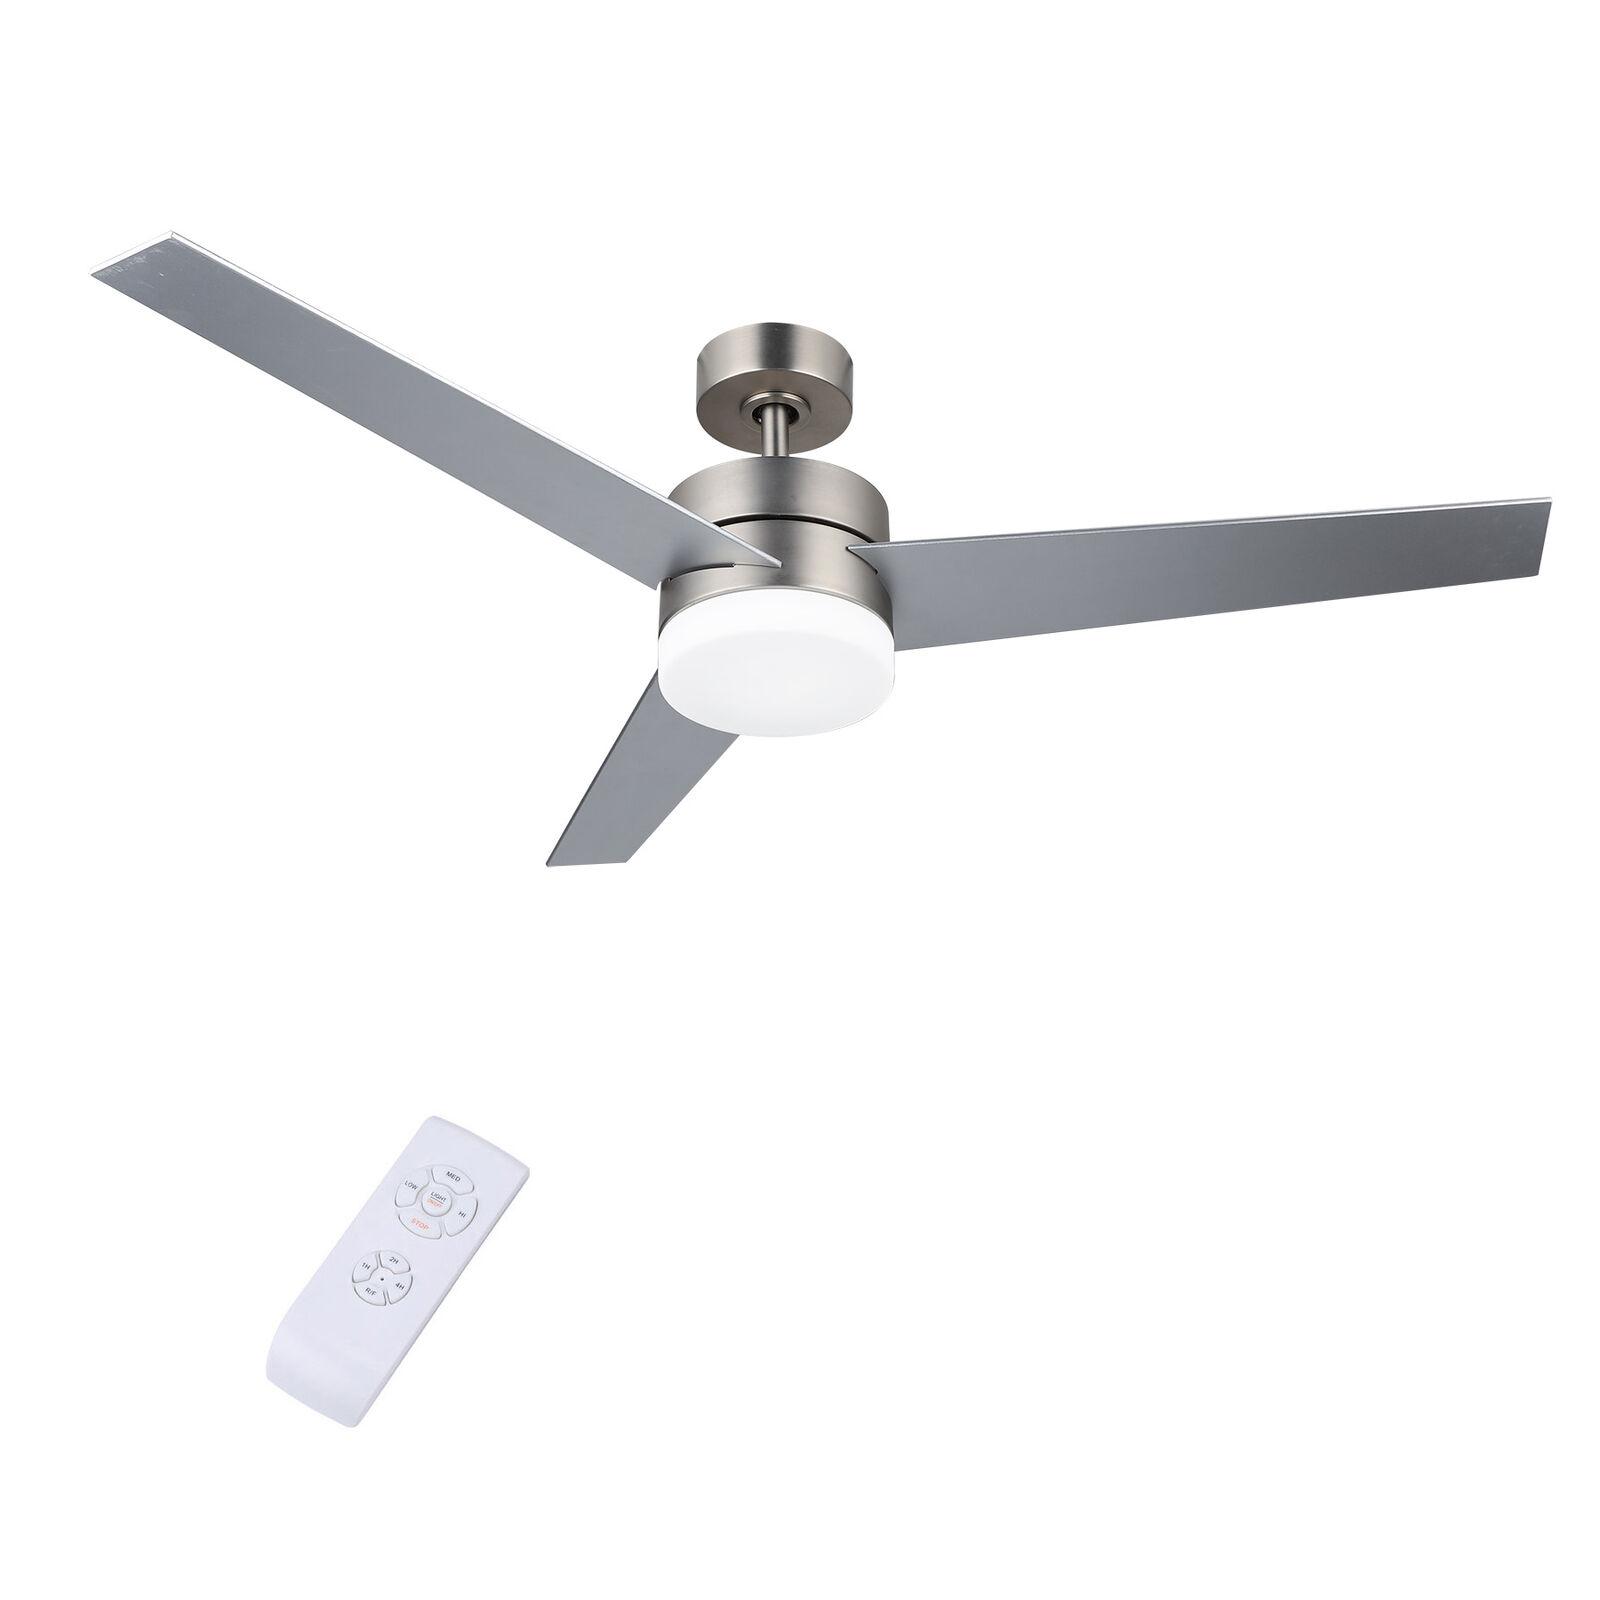 Quorum Ceiling Fan Remote Control For Sale Online Ebay